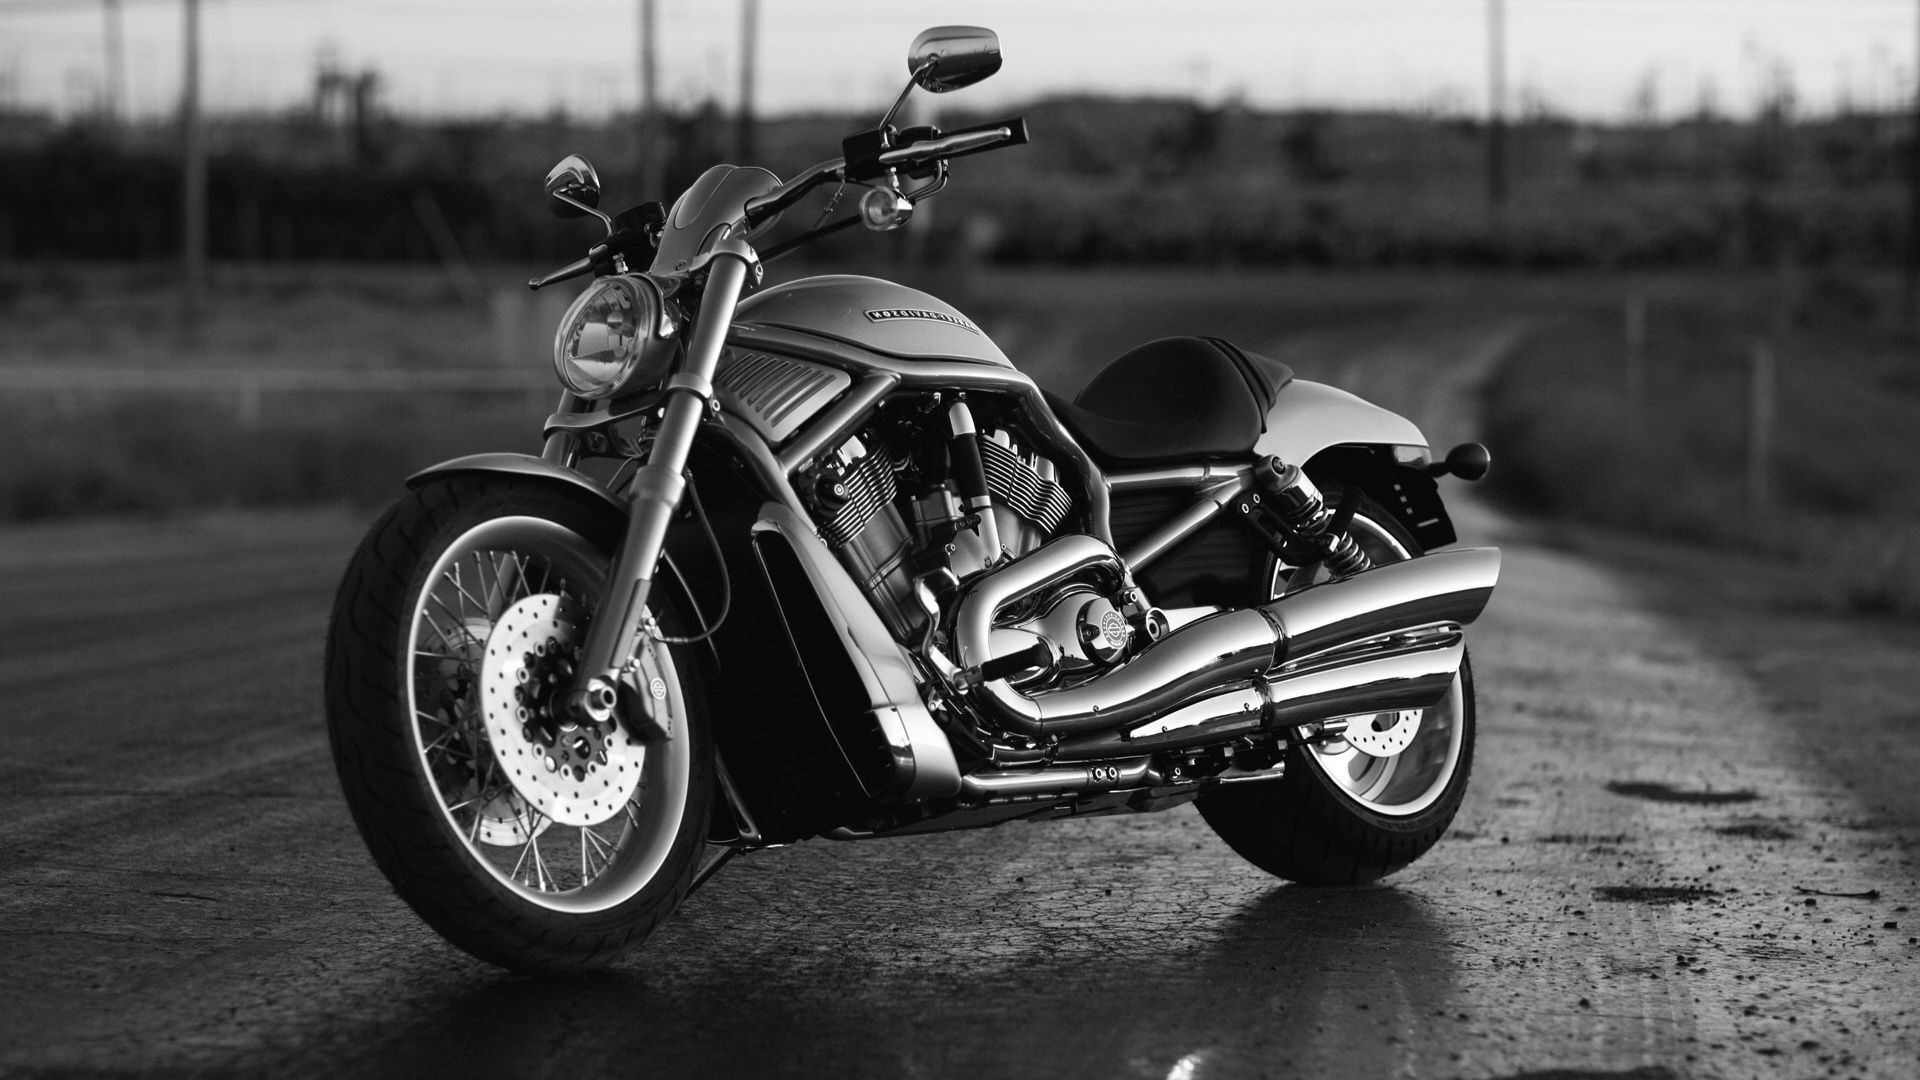 мотоцикл белый без регистрации